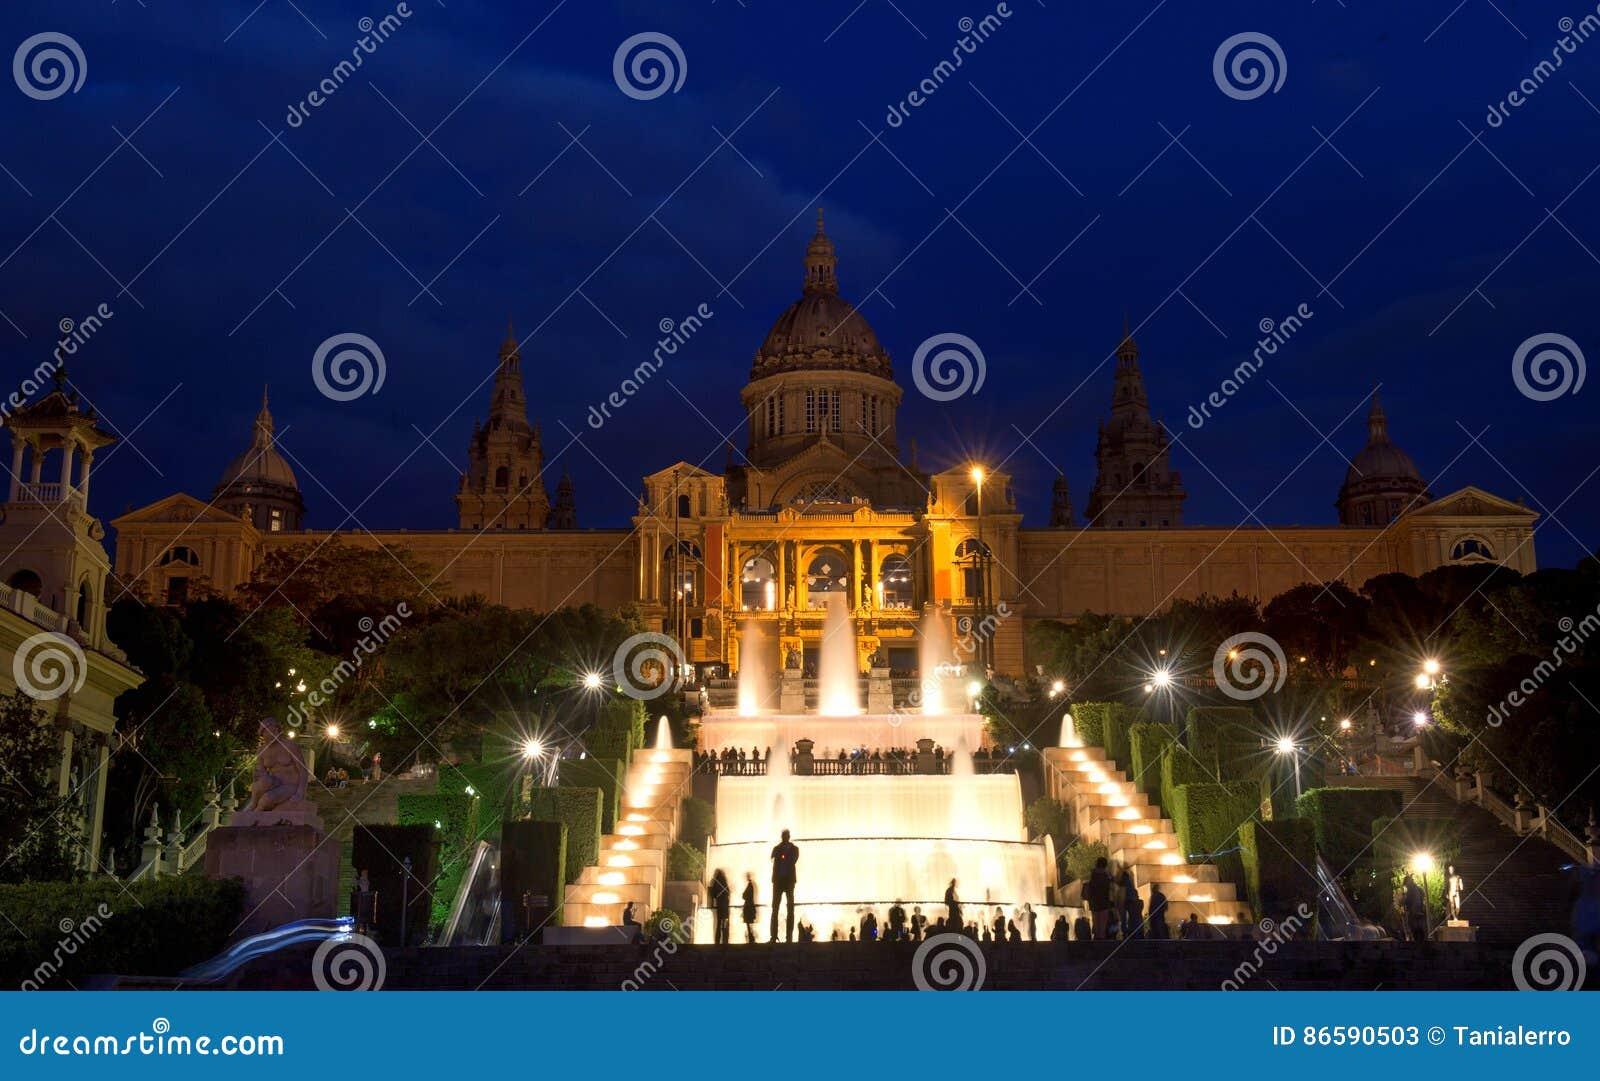 Barcelona, Spain - MNAC National art museum and fountain in Plaza de Espana